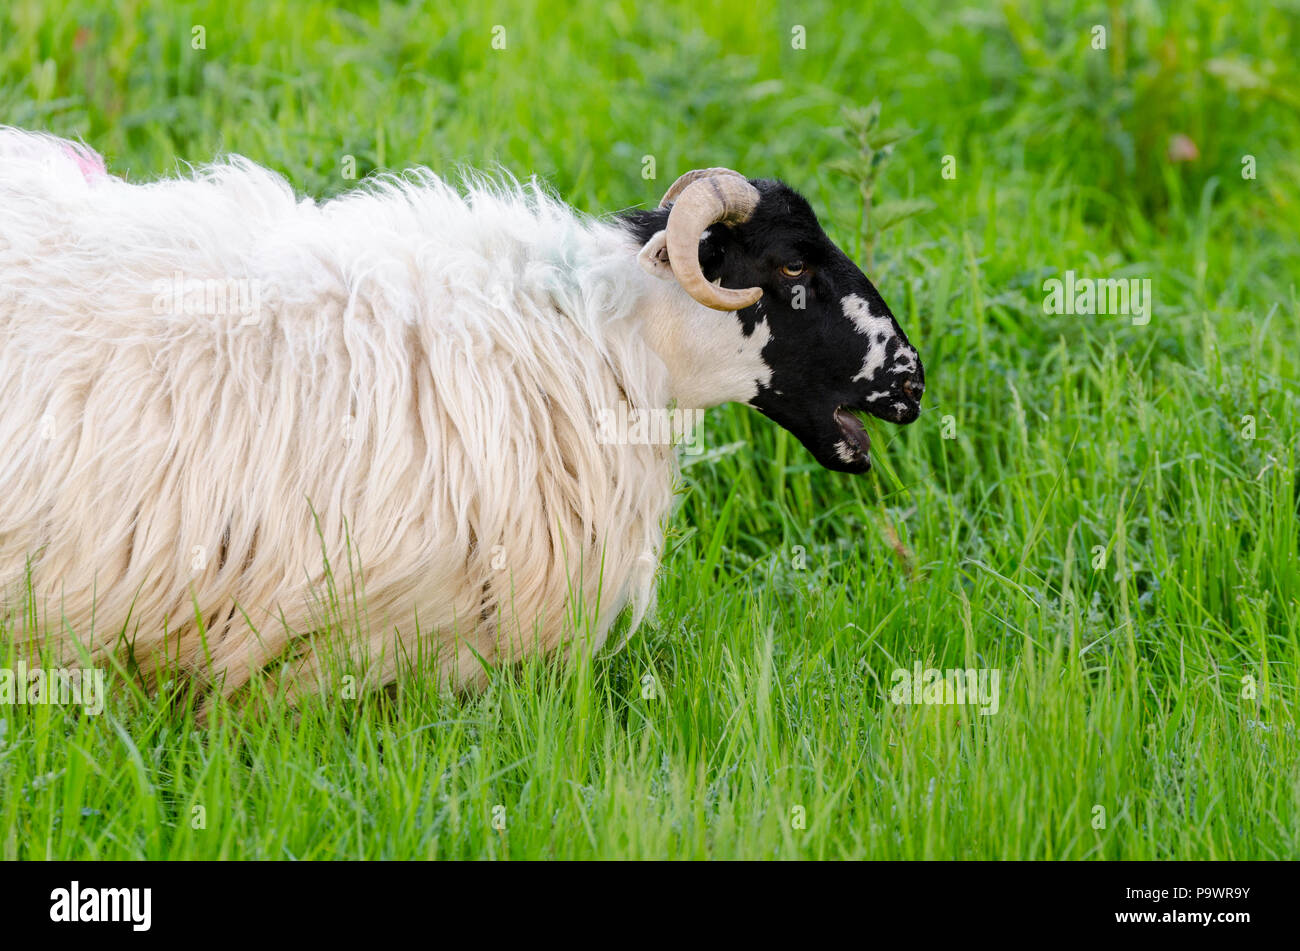 Scottish Blackface Sheep, Ovis aries, eating long grass in  the UK - Stock Image